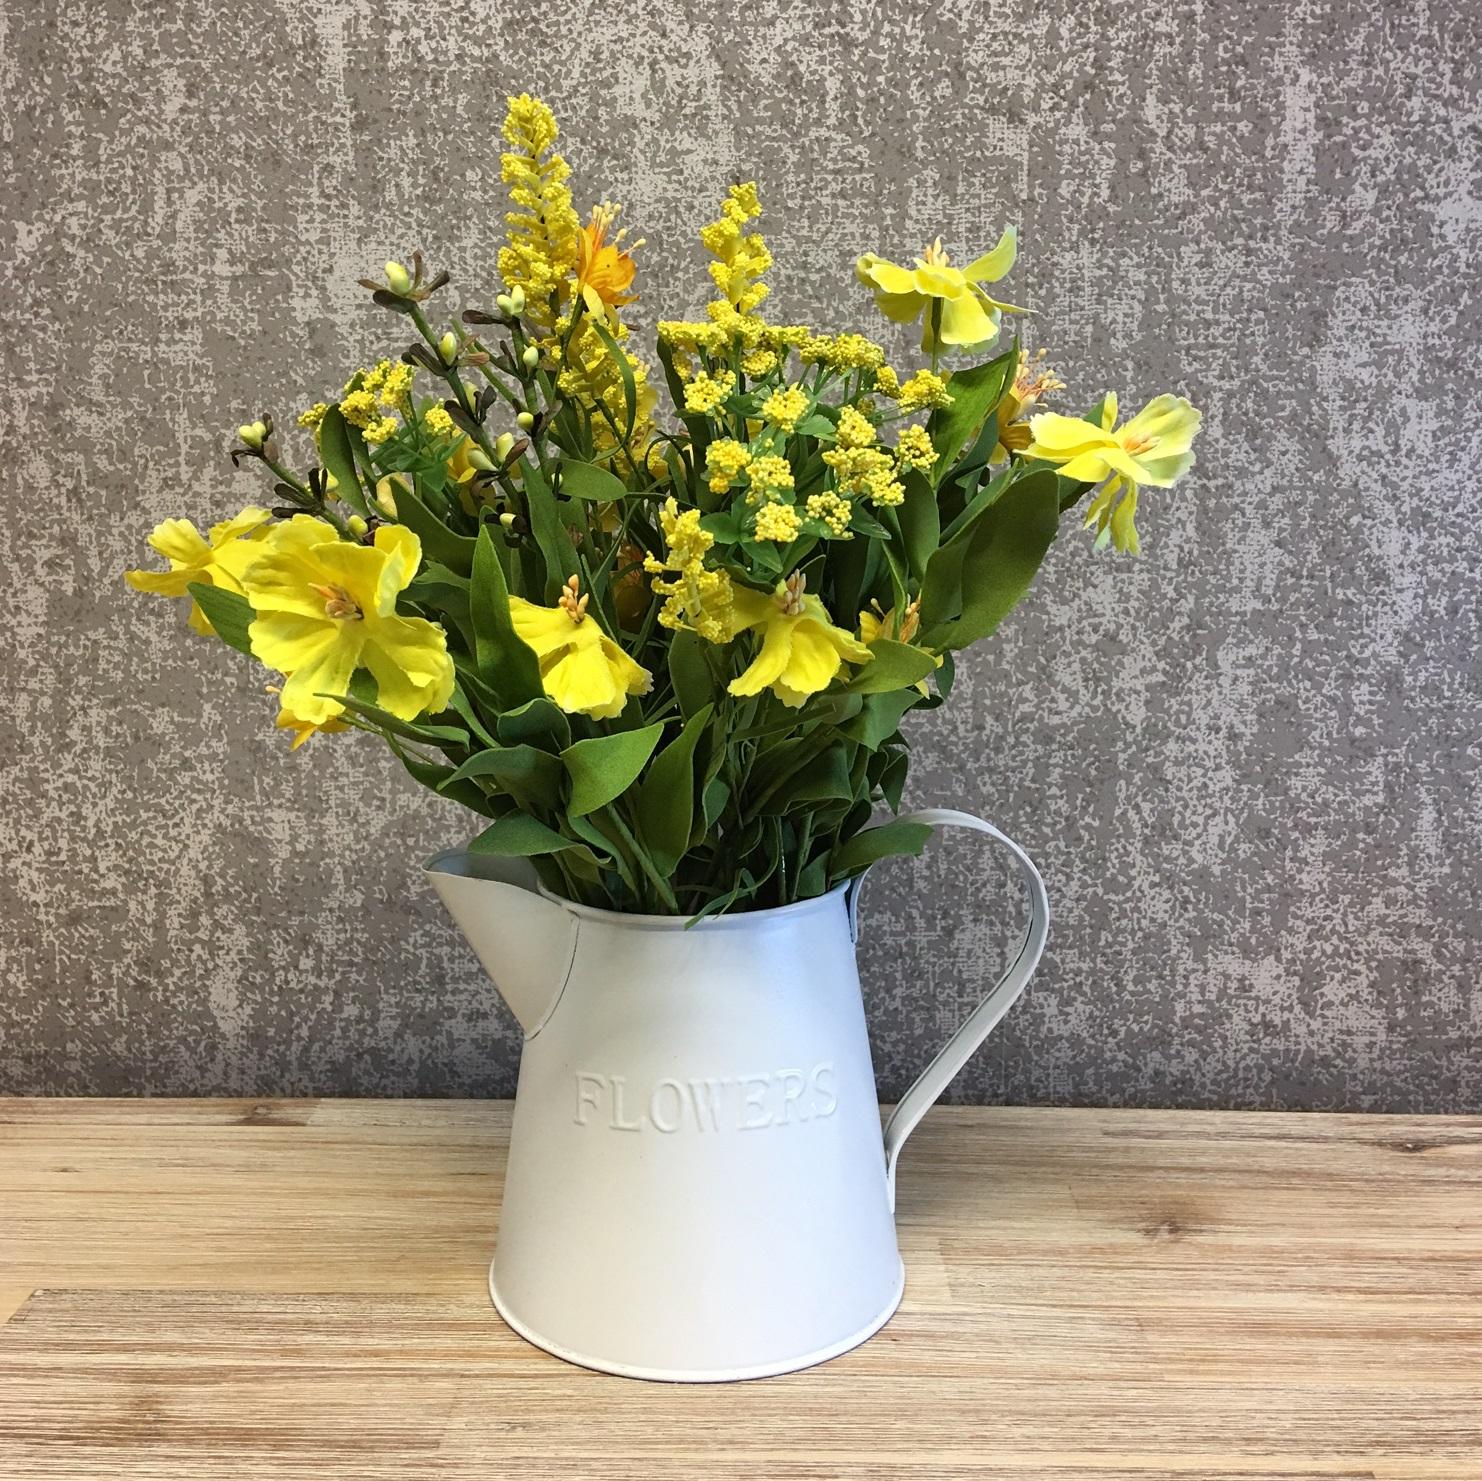 Yellow Wild Flower Bouquet Vintage Enamel Jug